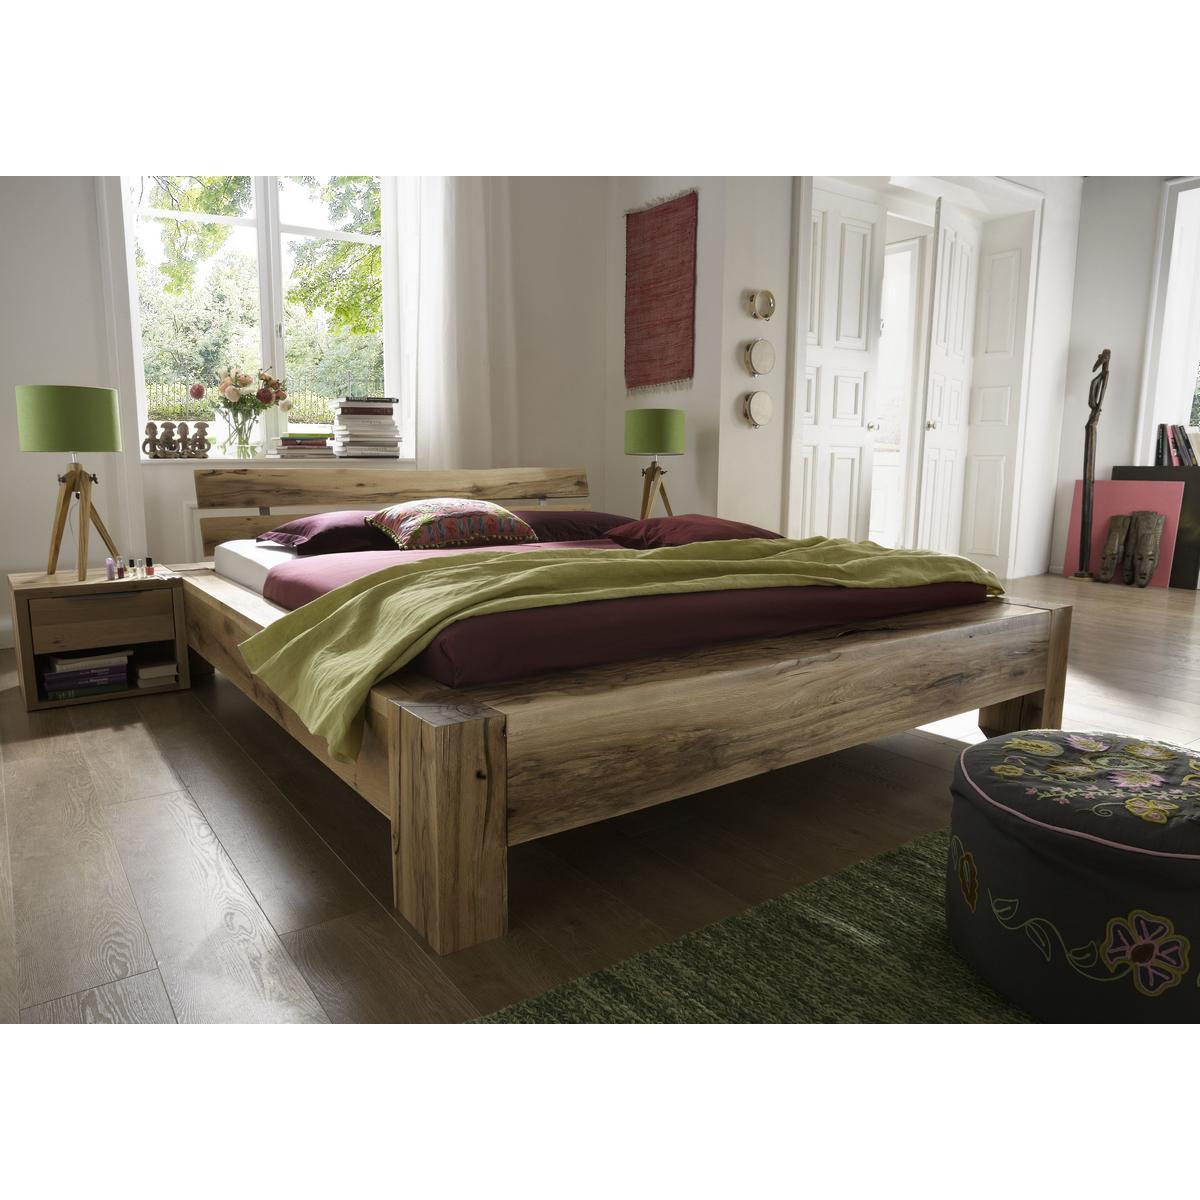 massivholz balkenbett 140x200 heavy sleep alba wildeiche massiv natur ge lt 2214 27 2120 3. Black Bedroom Furniture Sets. Home Design Ideas